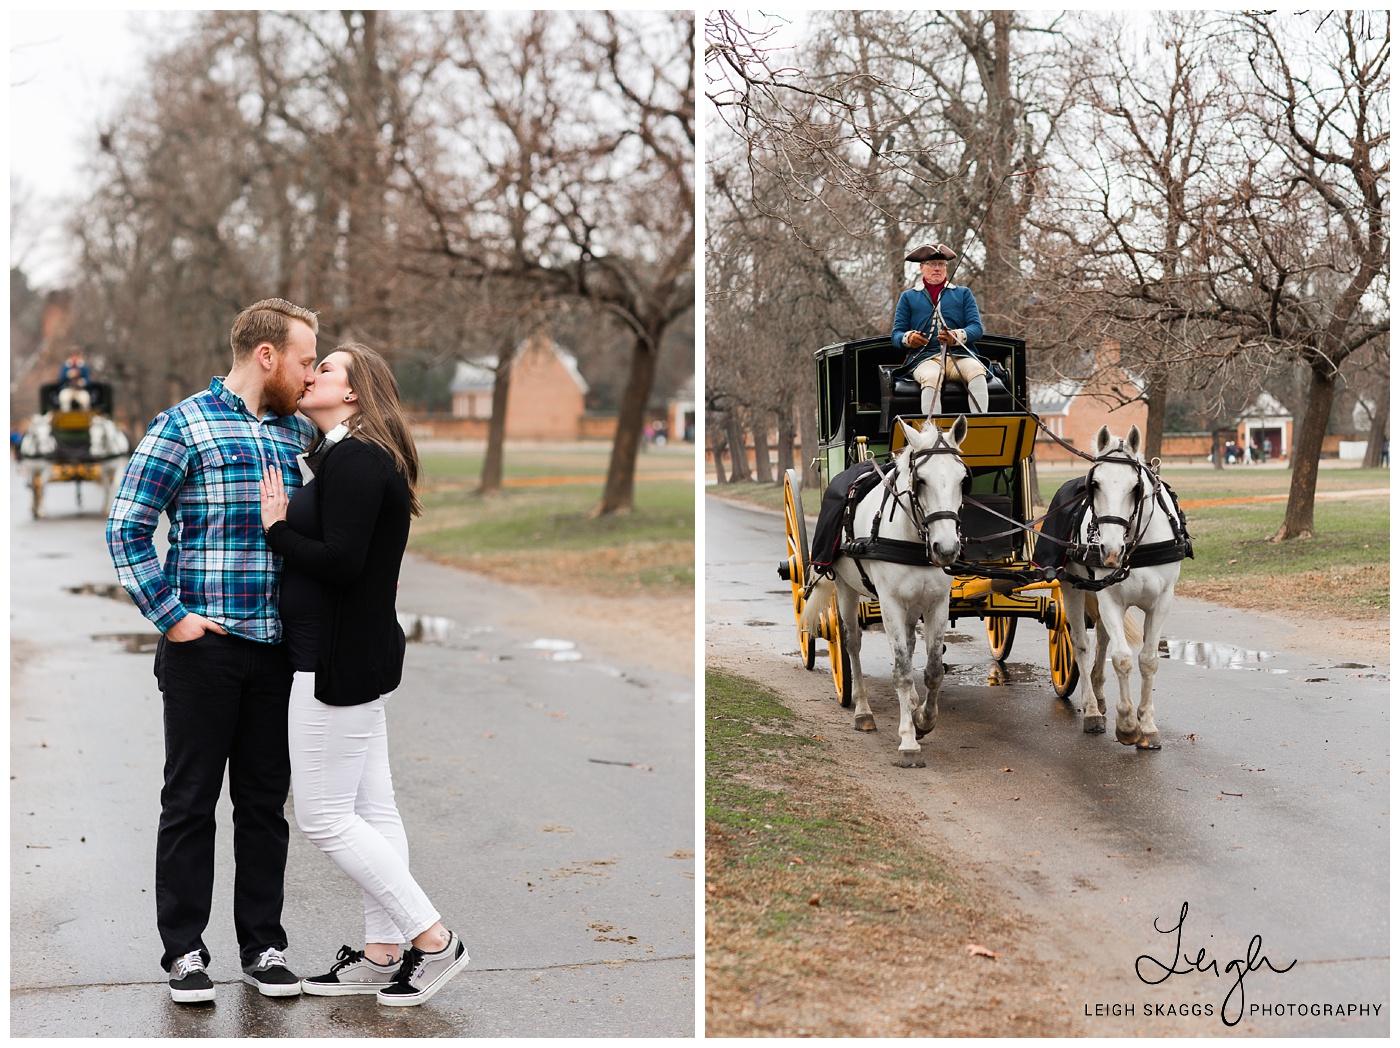 Meagan & Erik | Williamsburg Engagement session